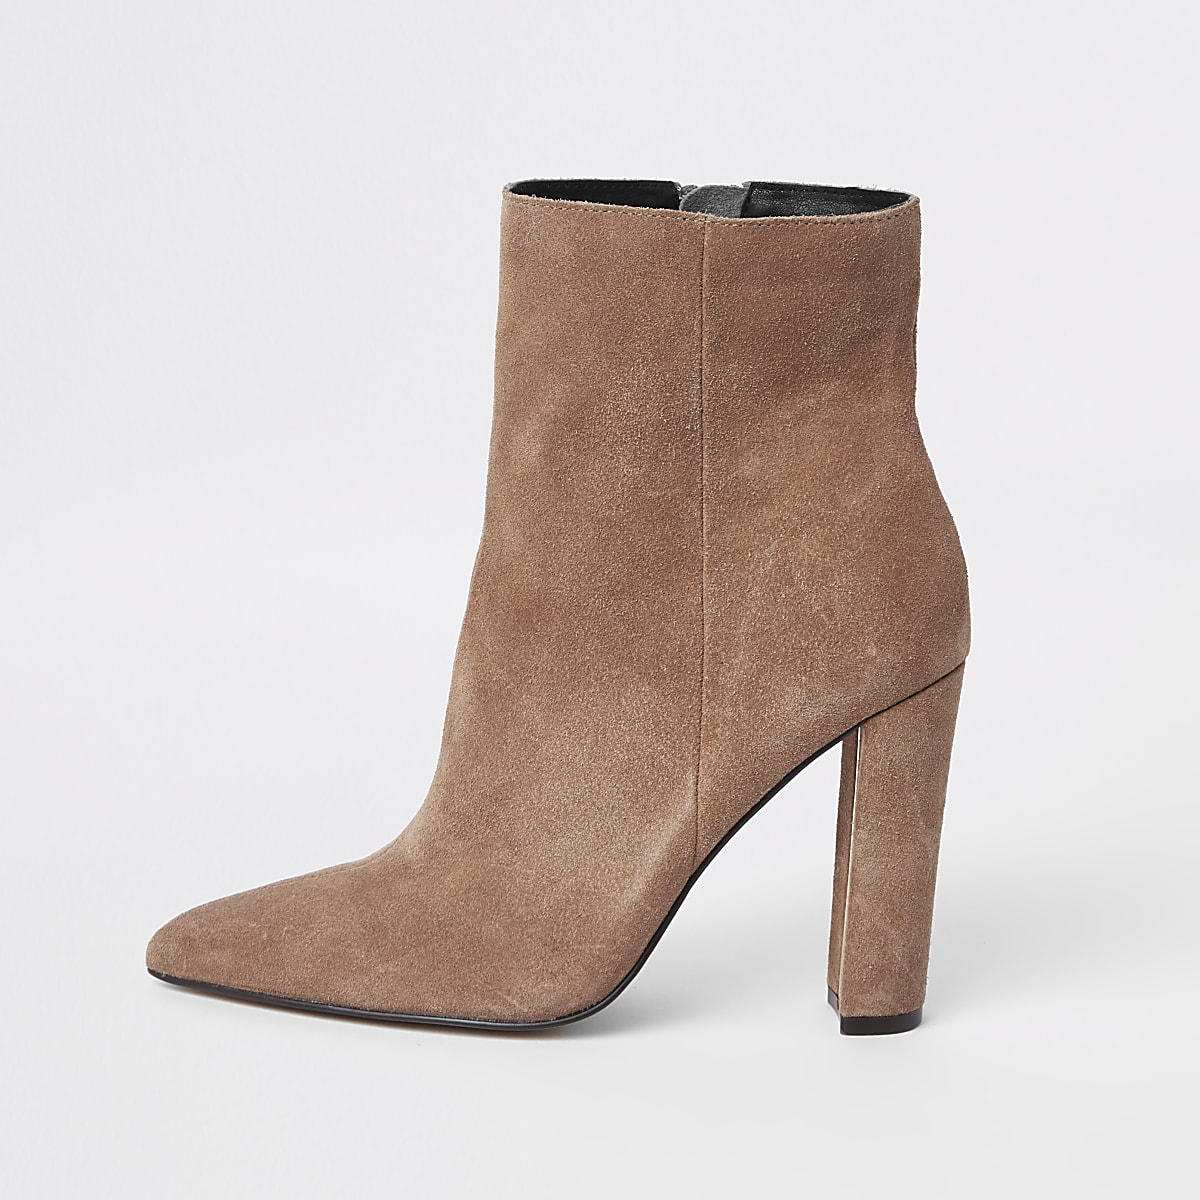 Light brown suede pointed toe block heel boot